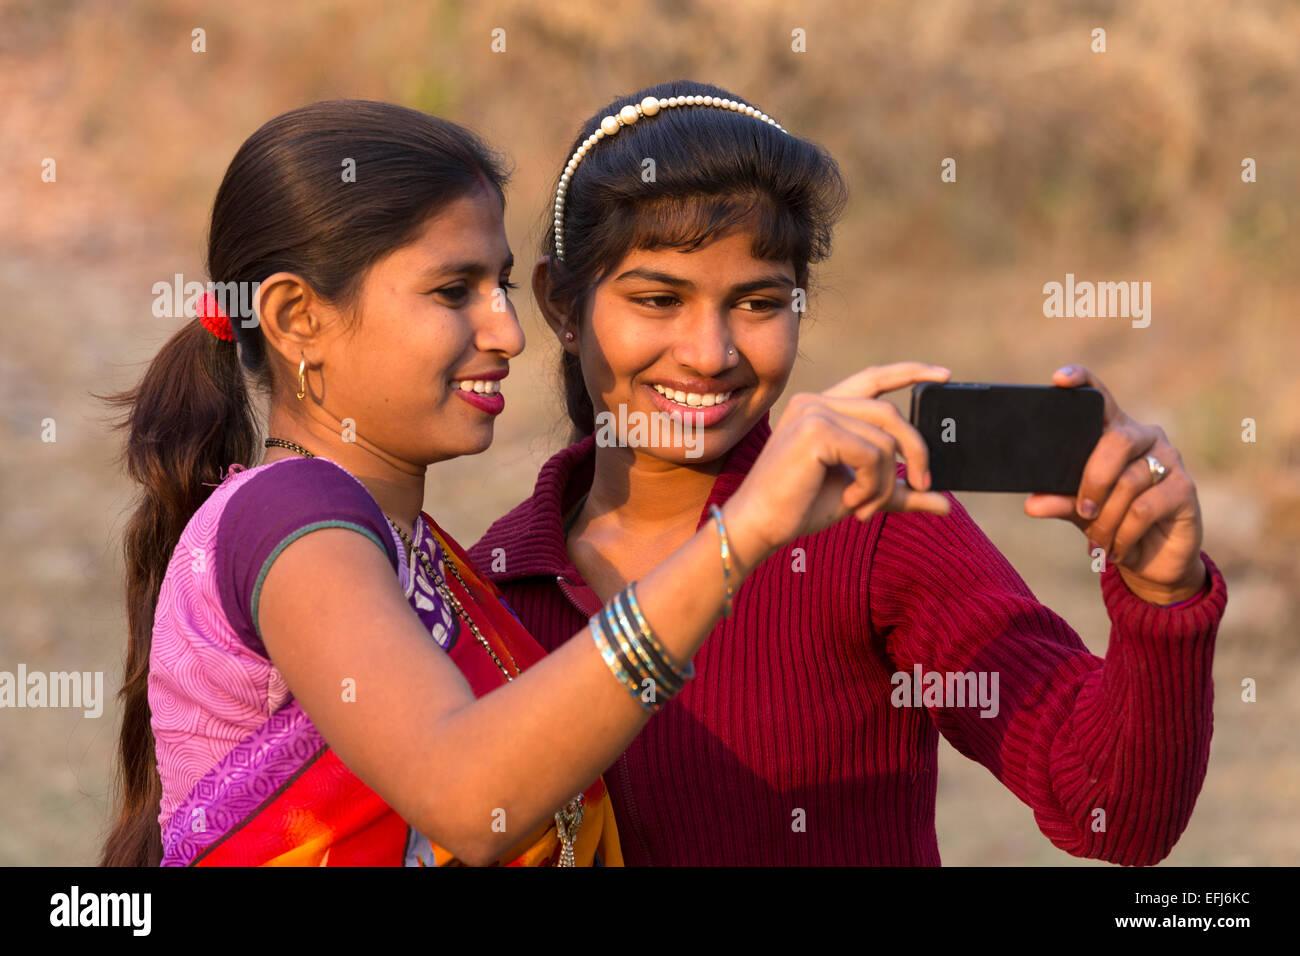 India, Uttar Pradesh, Agra, two sisters taking selfie - Stock Image